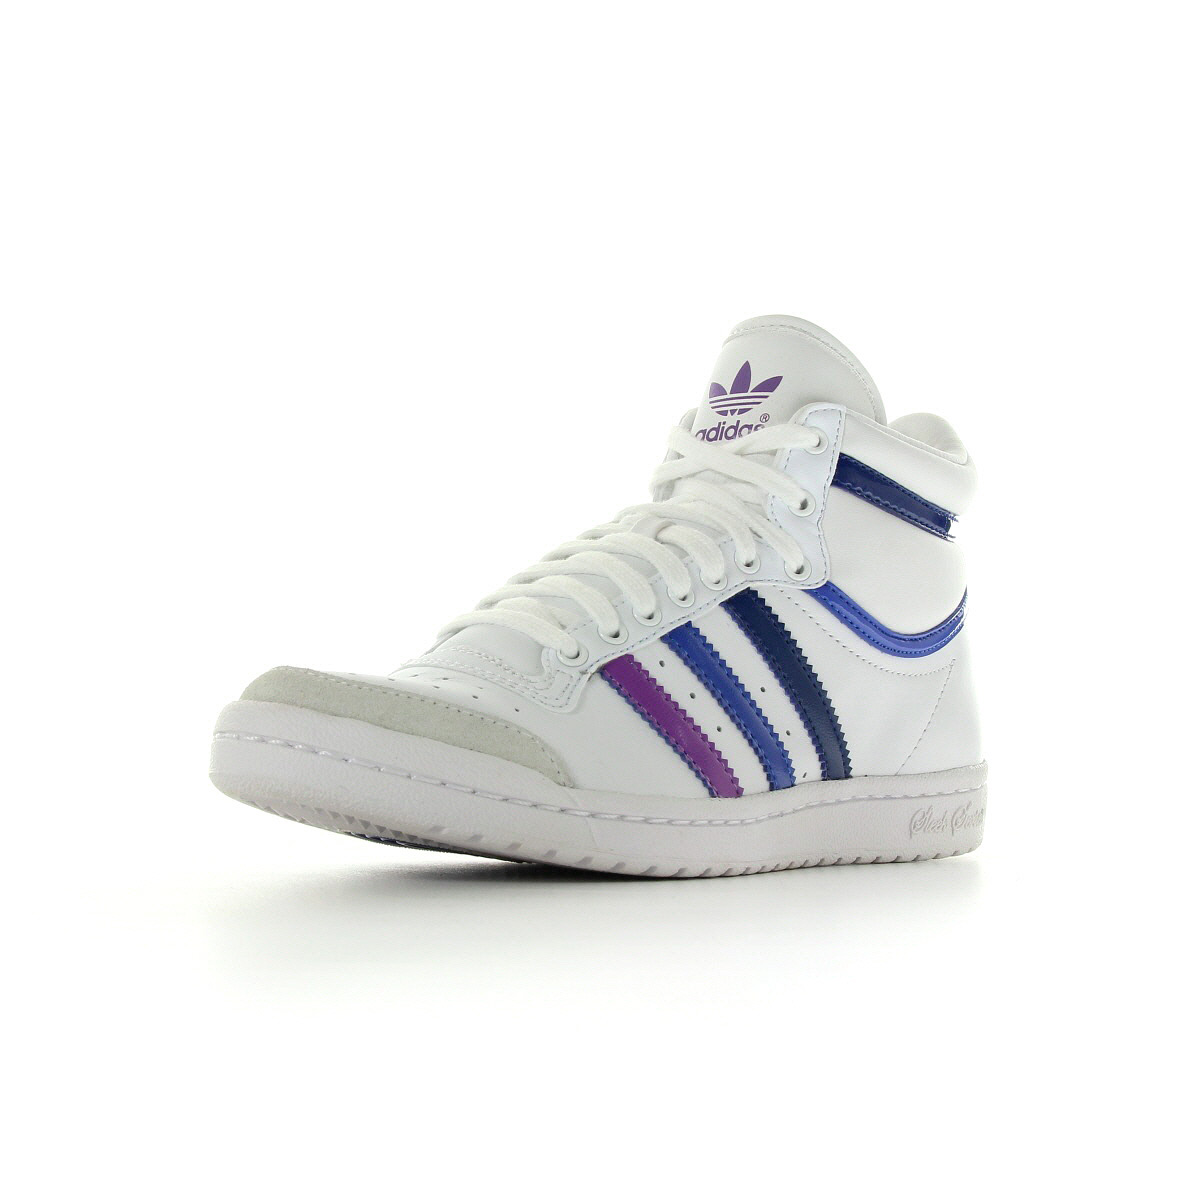 Chaussures baskets adidas femme top ten high sleek w taille blanc blanche cuir ebay for Baskets blanches femme